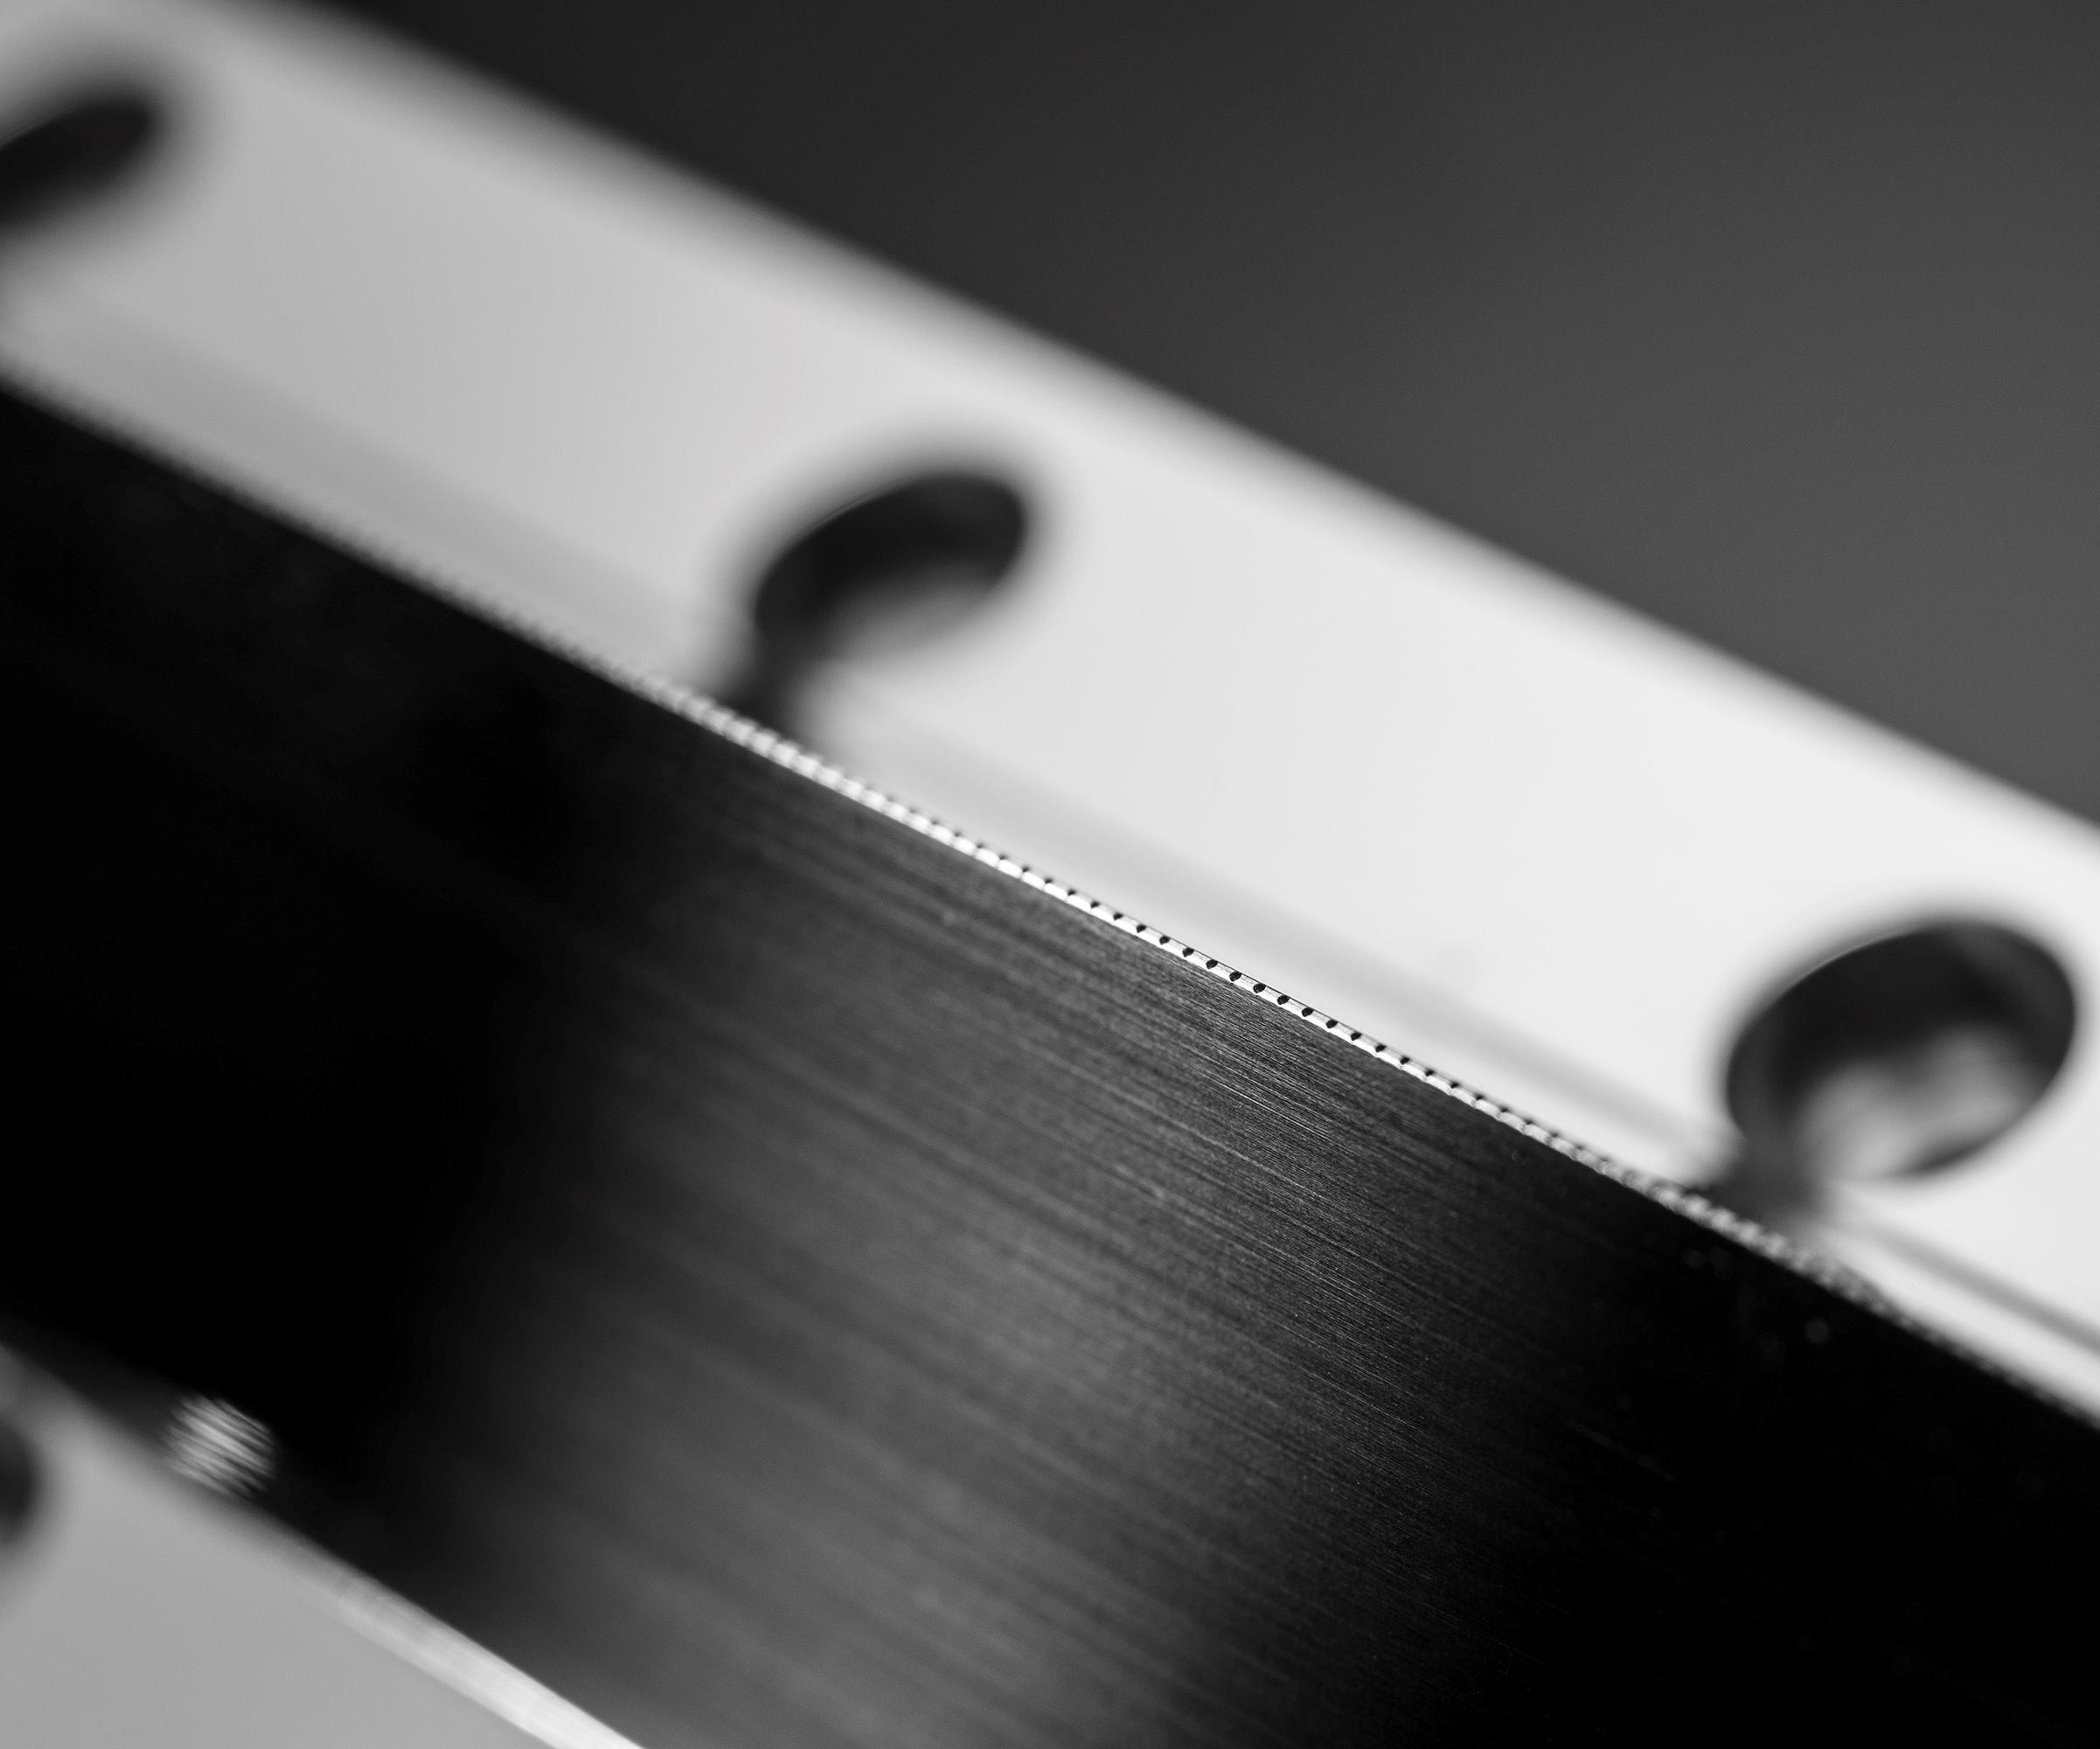 EDM Enables DIY Form Tools : Production Machining